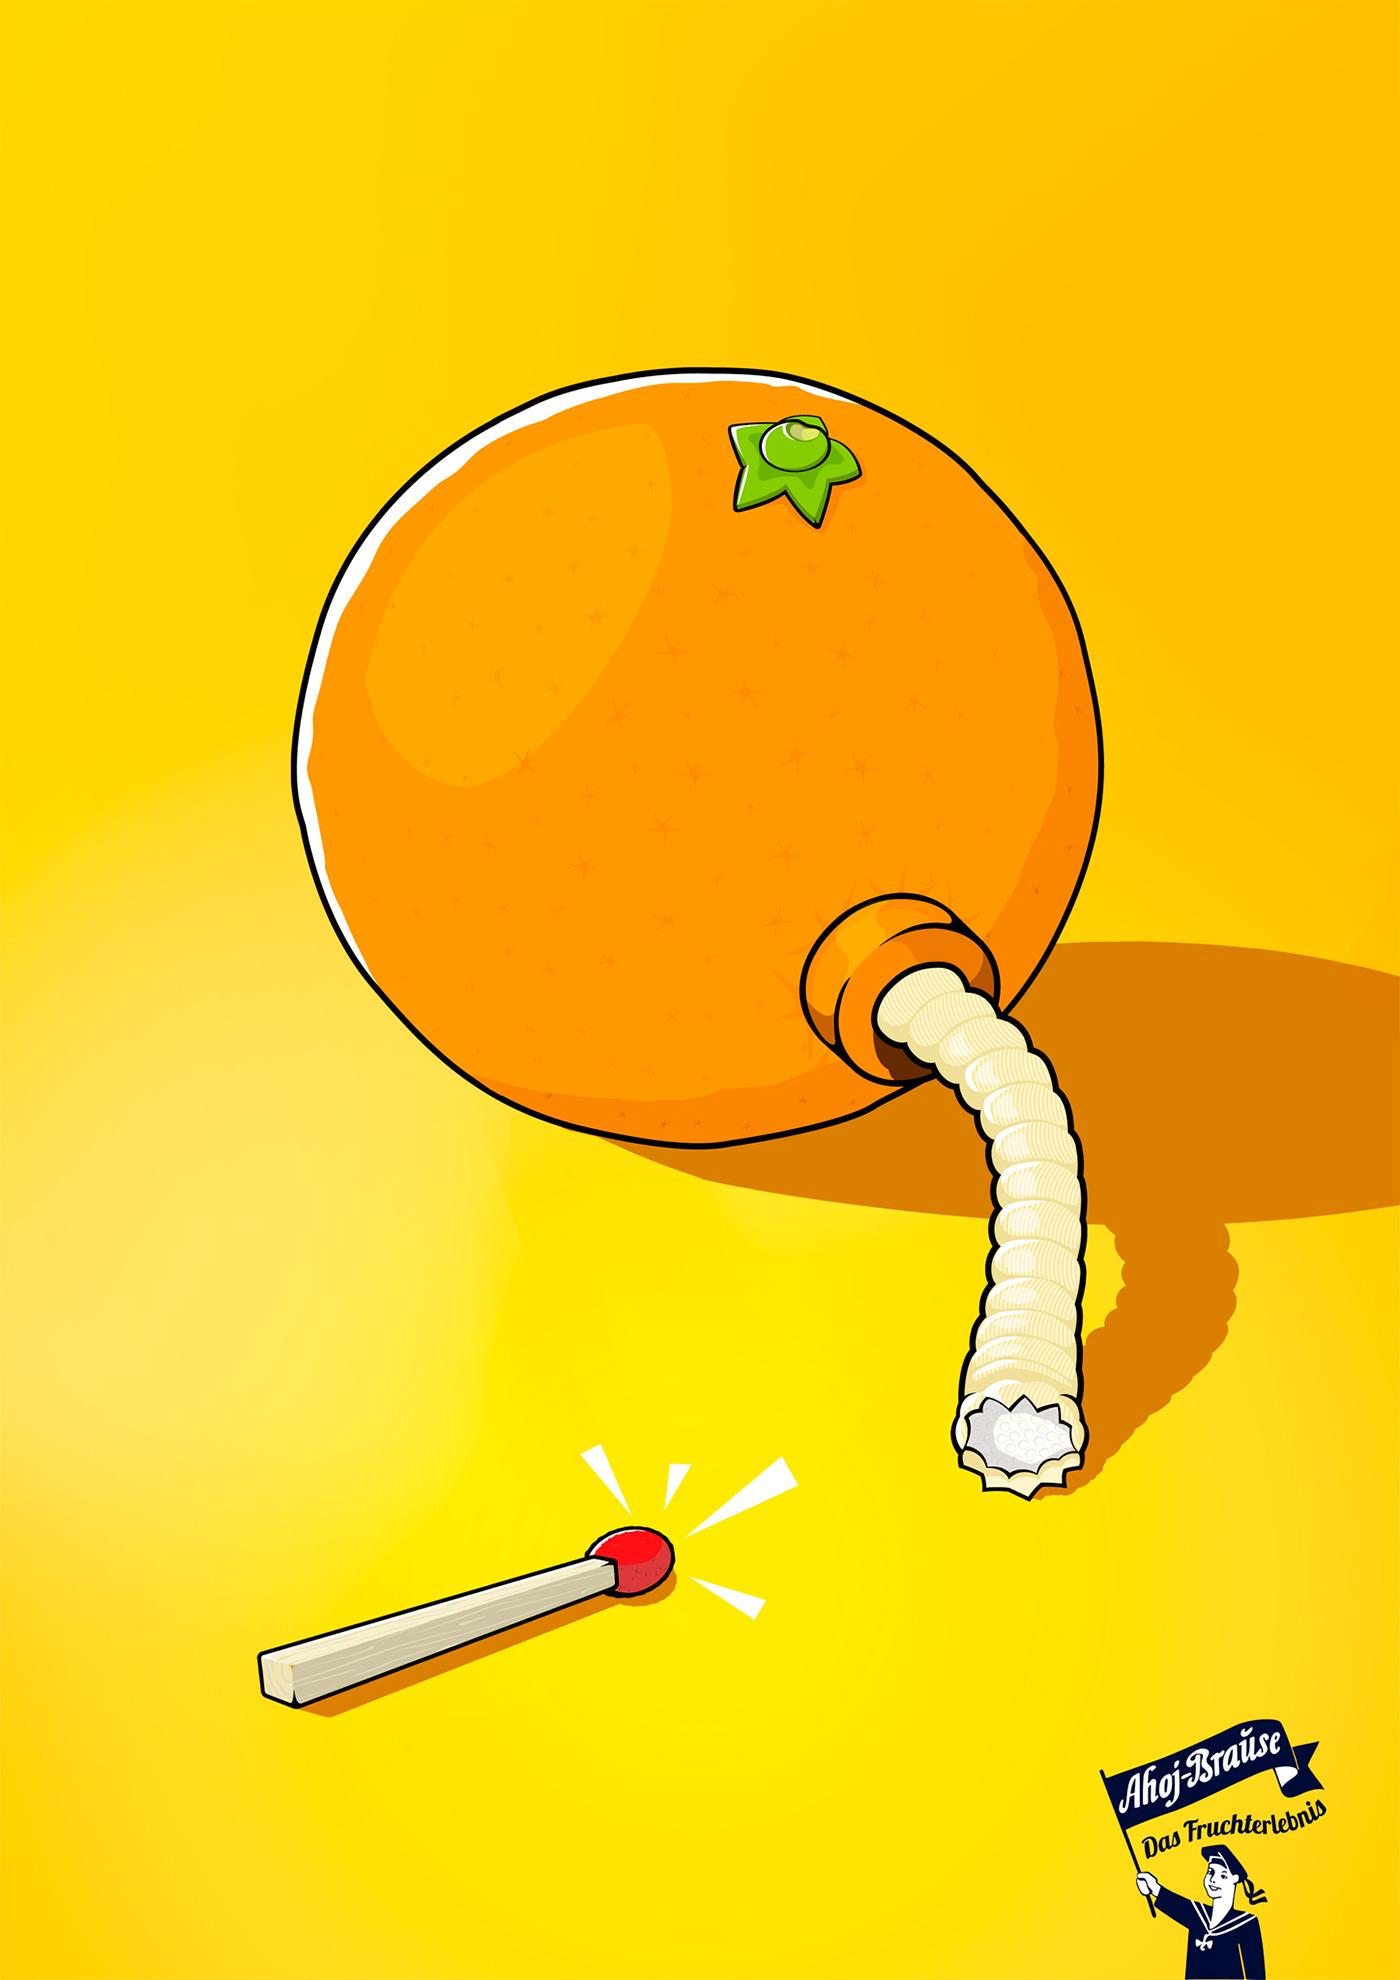 Ahoj Brause ballon  orange lemon bomb fire  pulver pichler  warzilek vienna  Austria Adronauts